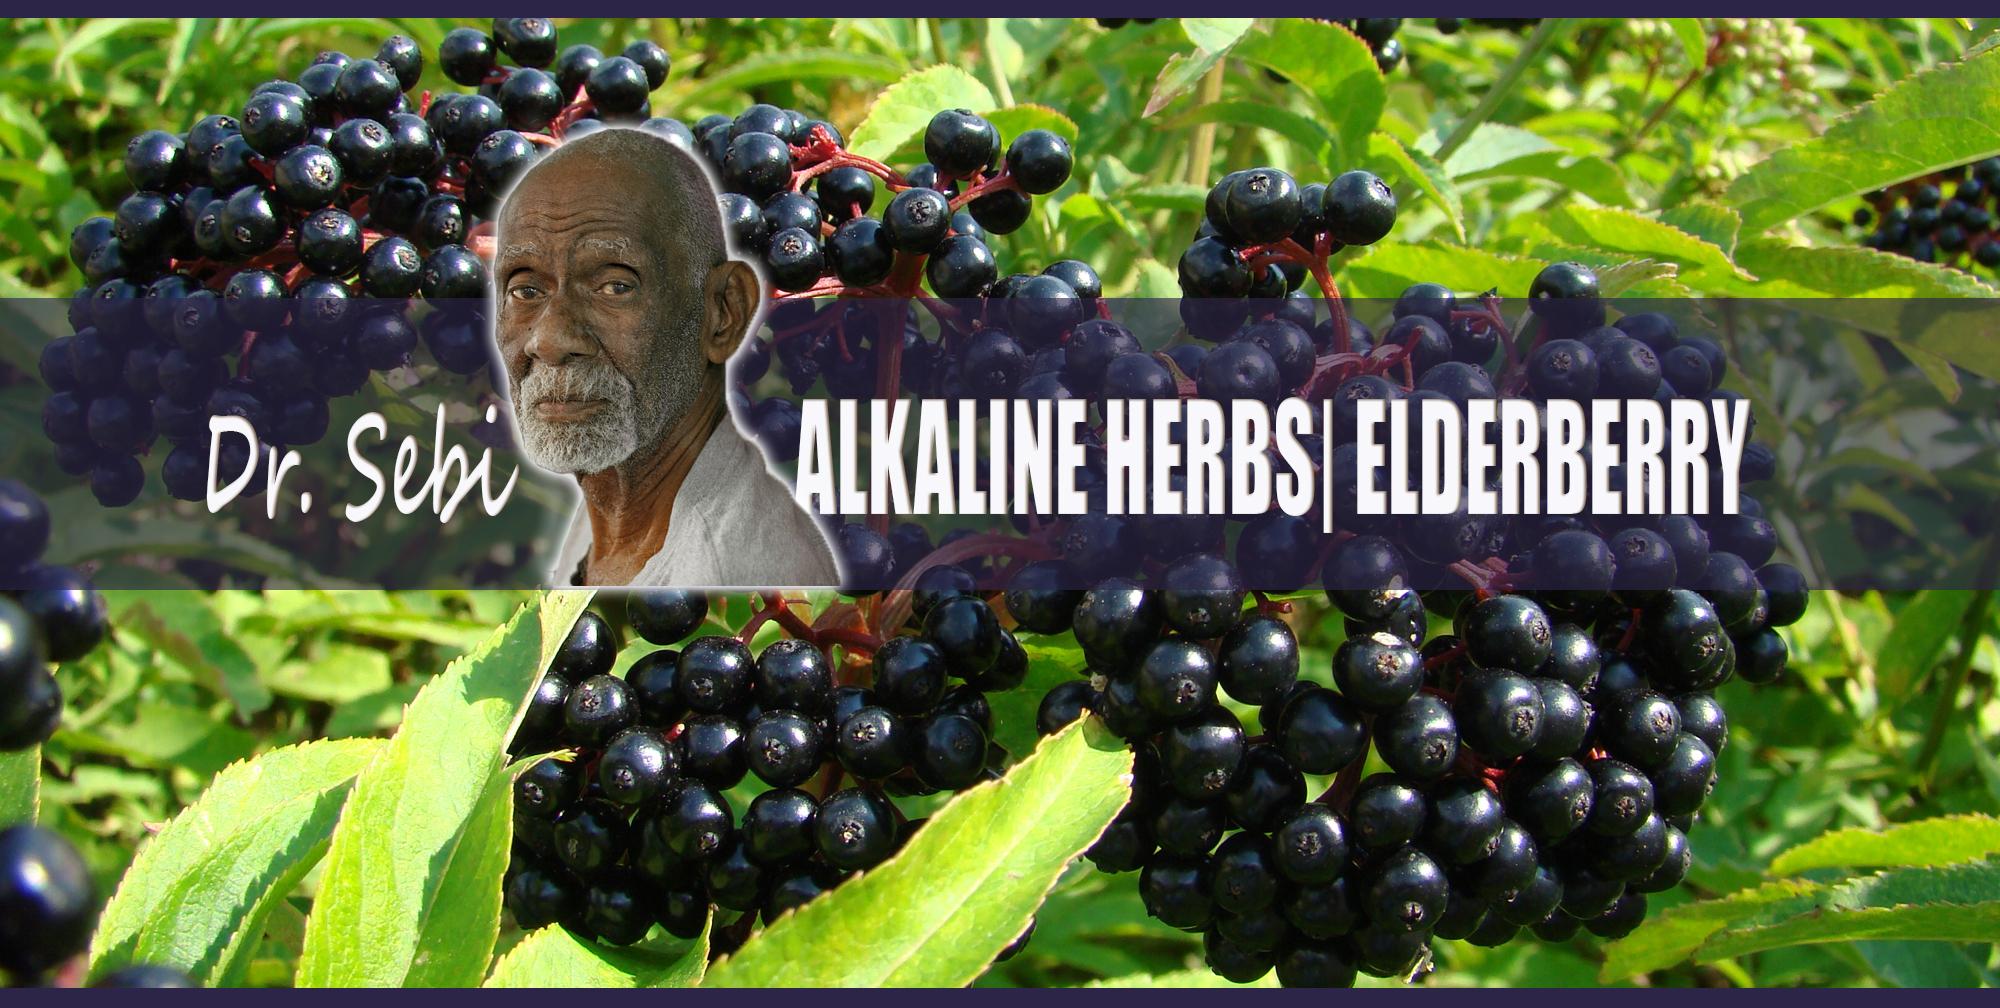 Dr Sebi's Alkaline Herbs: Elderberry